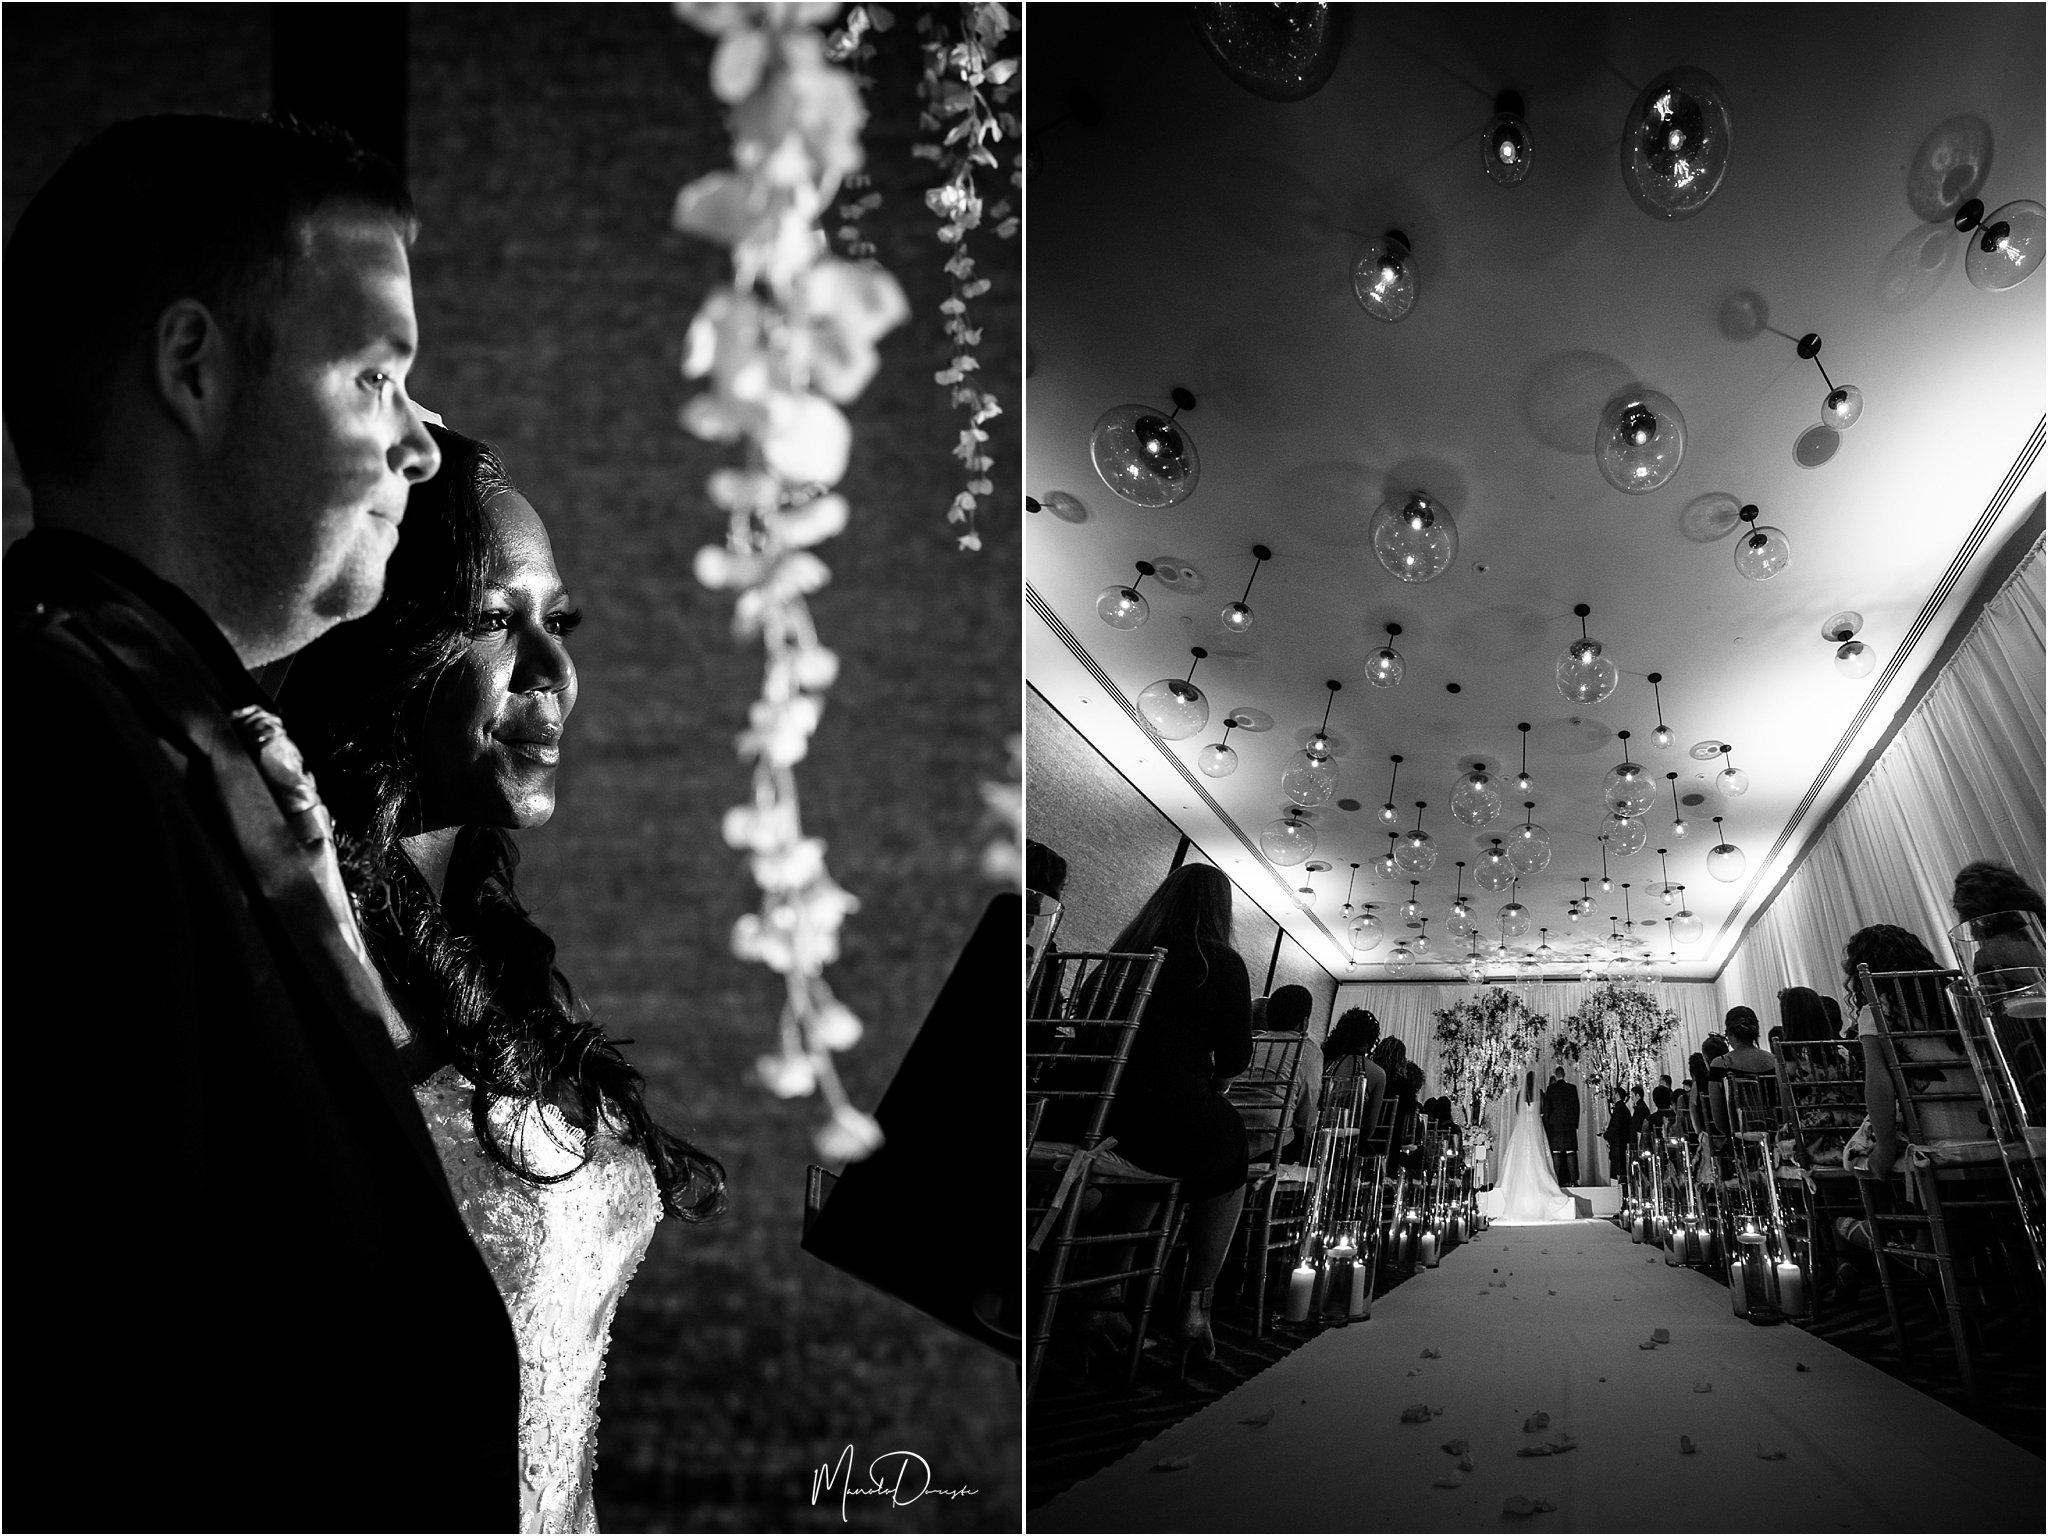 0119_ManoloDoreste_InFocusStudios_Wedding_Family_Photography_Miami_MiamiPhotographer.jpg